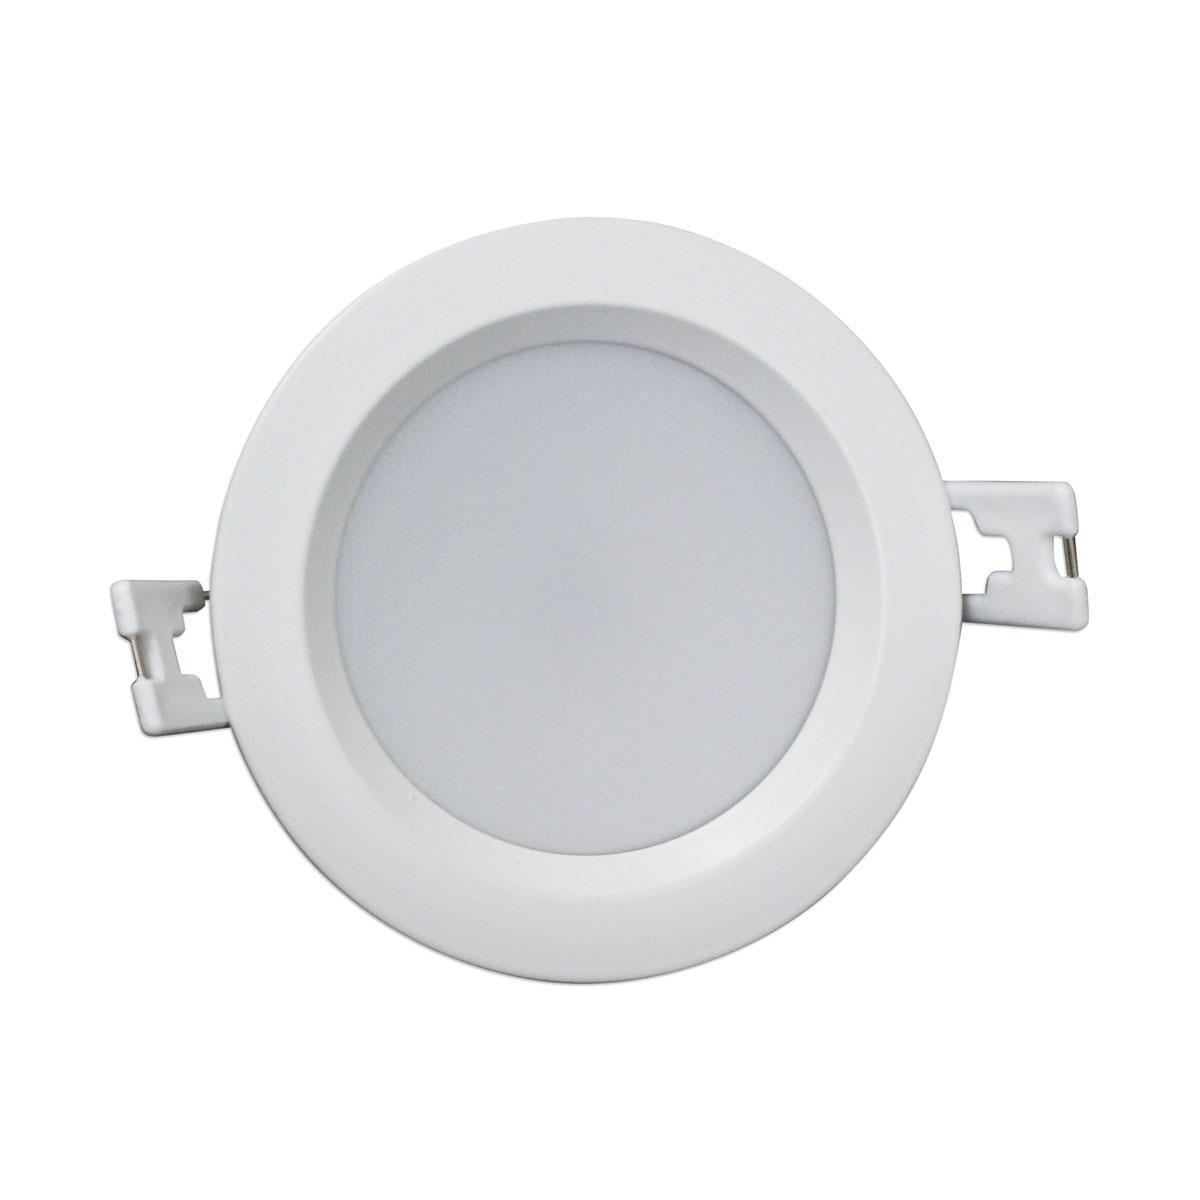 Уличный светильник Kink Light 2148 , LED